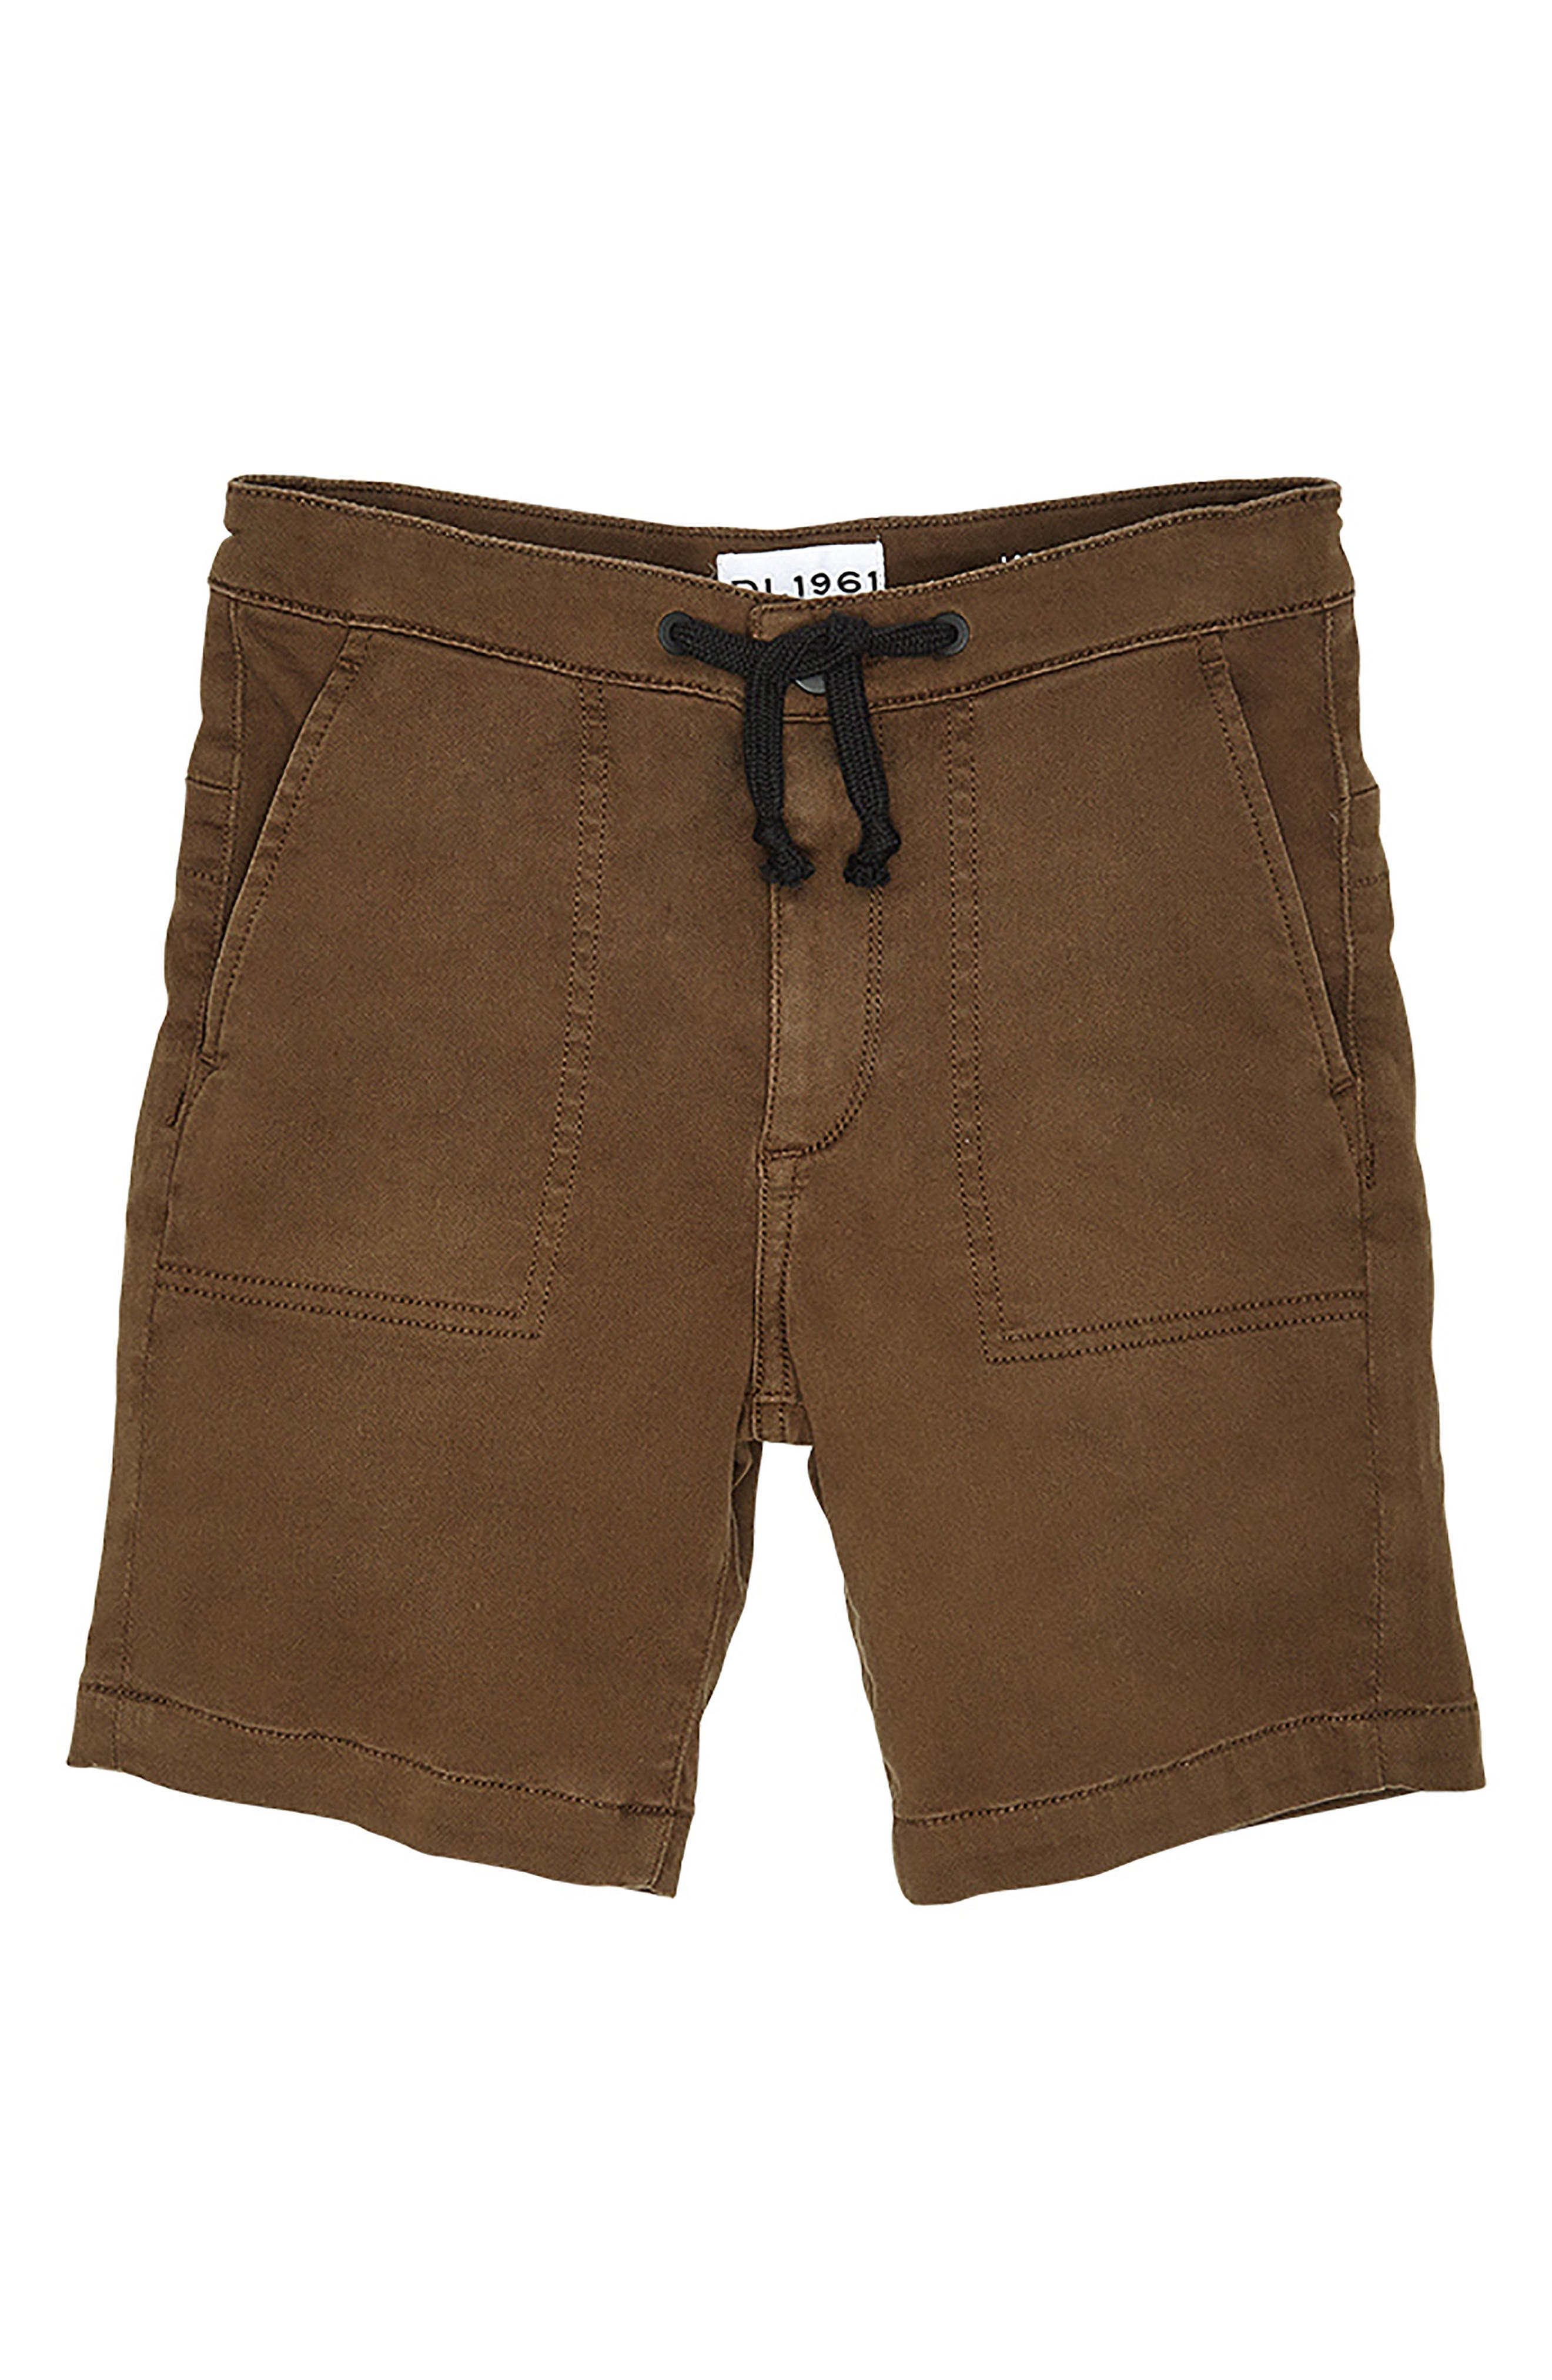 DL1961 Jax Utility Shorts (Toddler Boys & Little Boys)